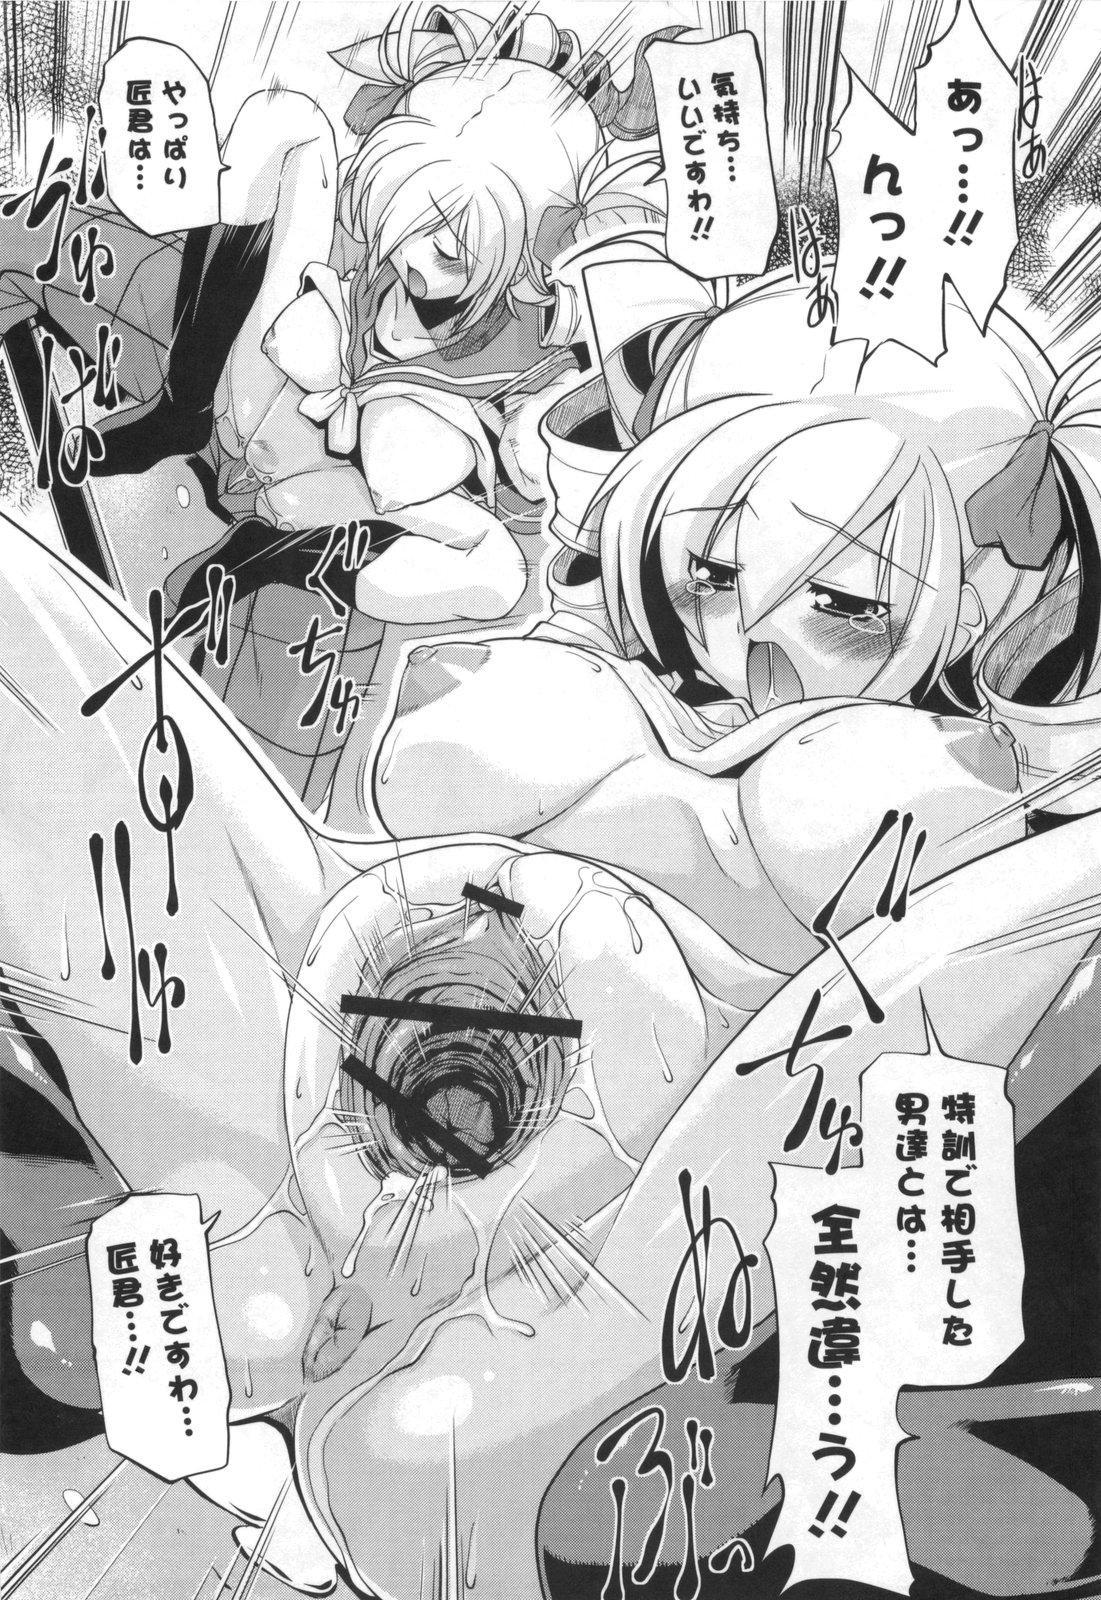 [Gyonikun] Gosyujin-sama Senyou!? Ami-sama Senyou 179